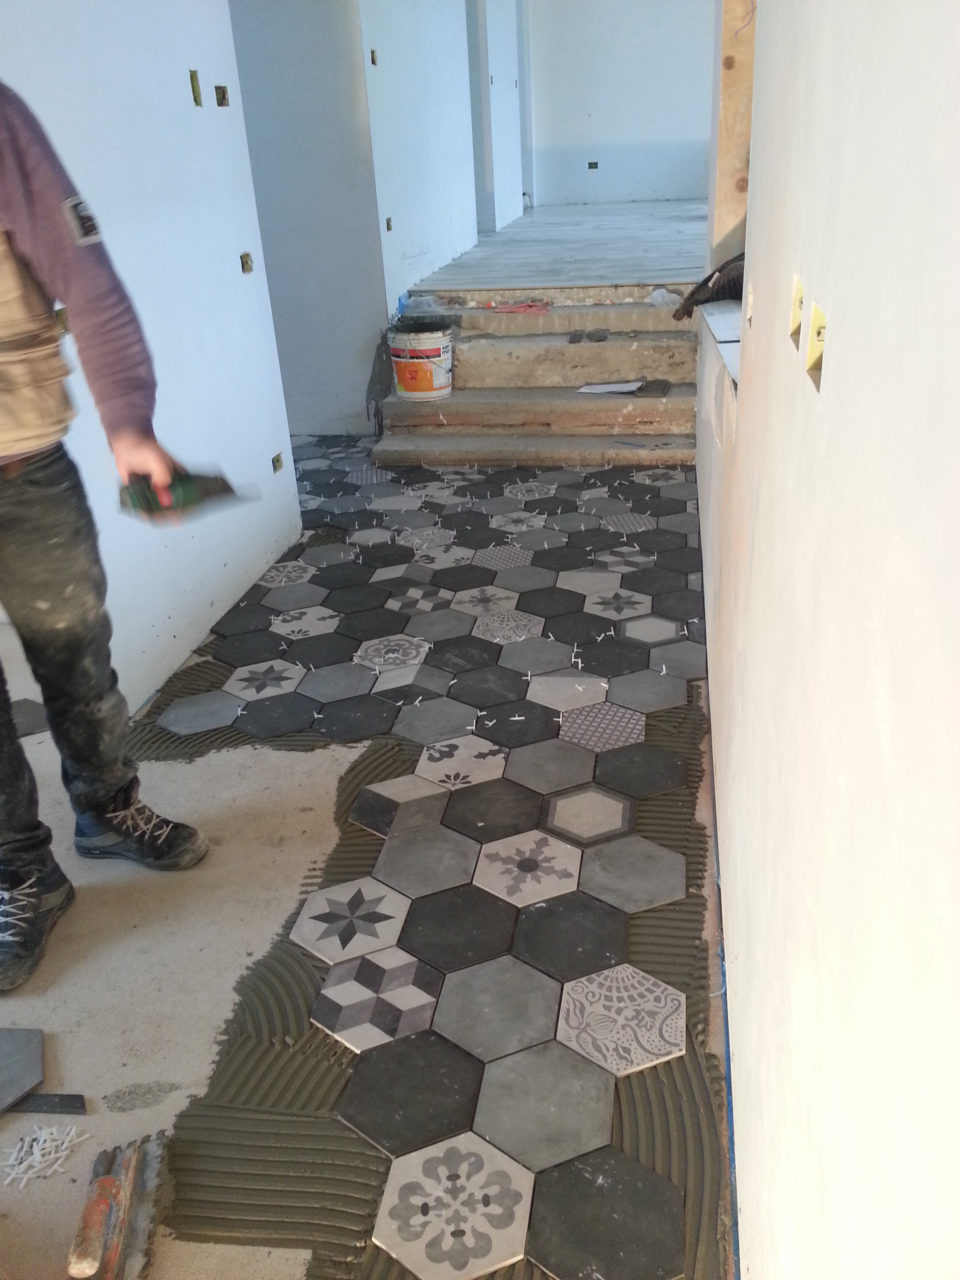 Mattonelle esagonali cucina top piastrelle cucina mosaico for Mattonelle finte per cucina